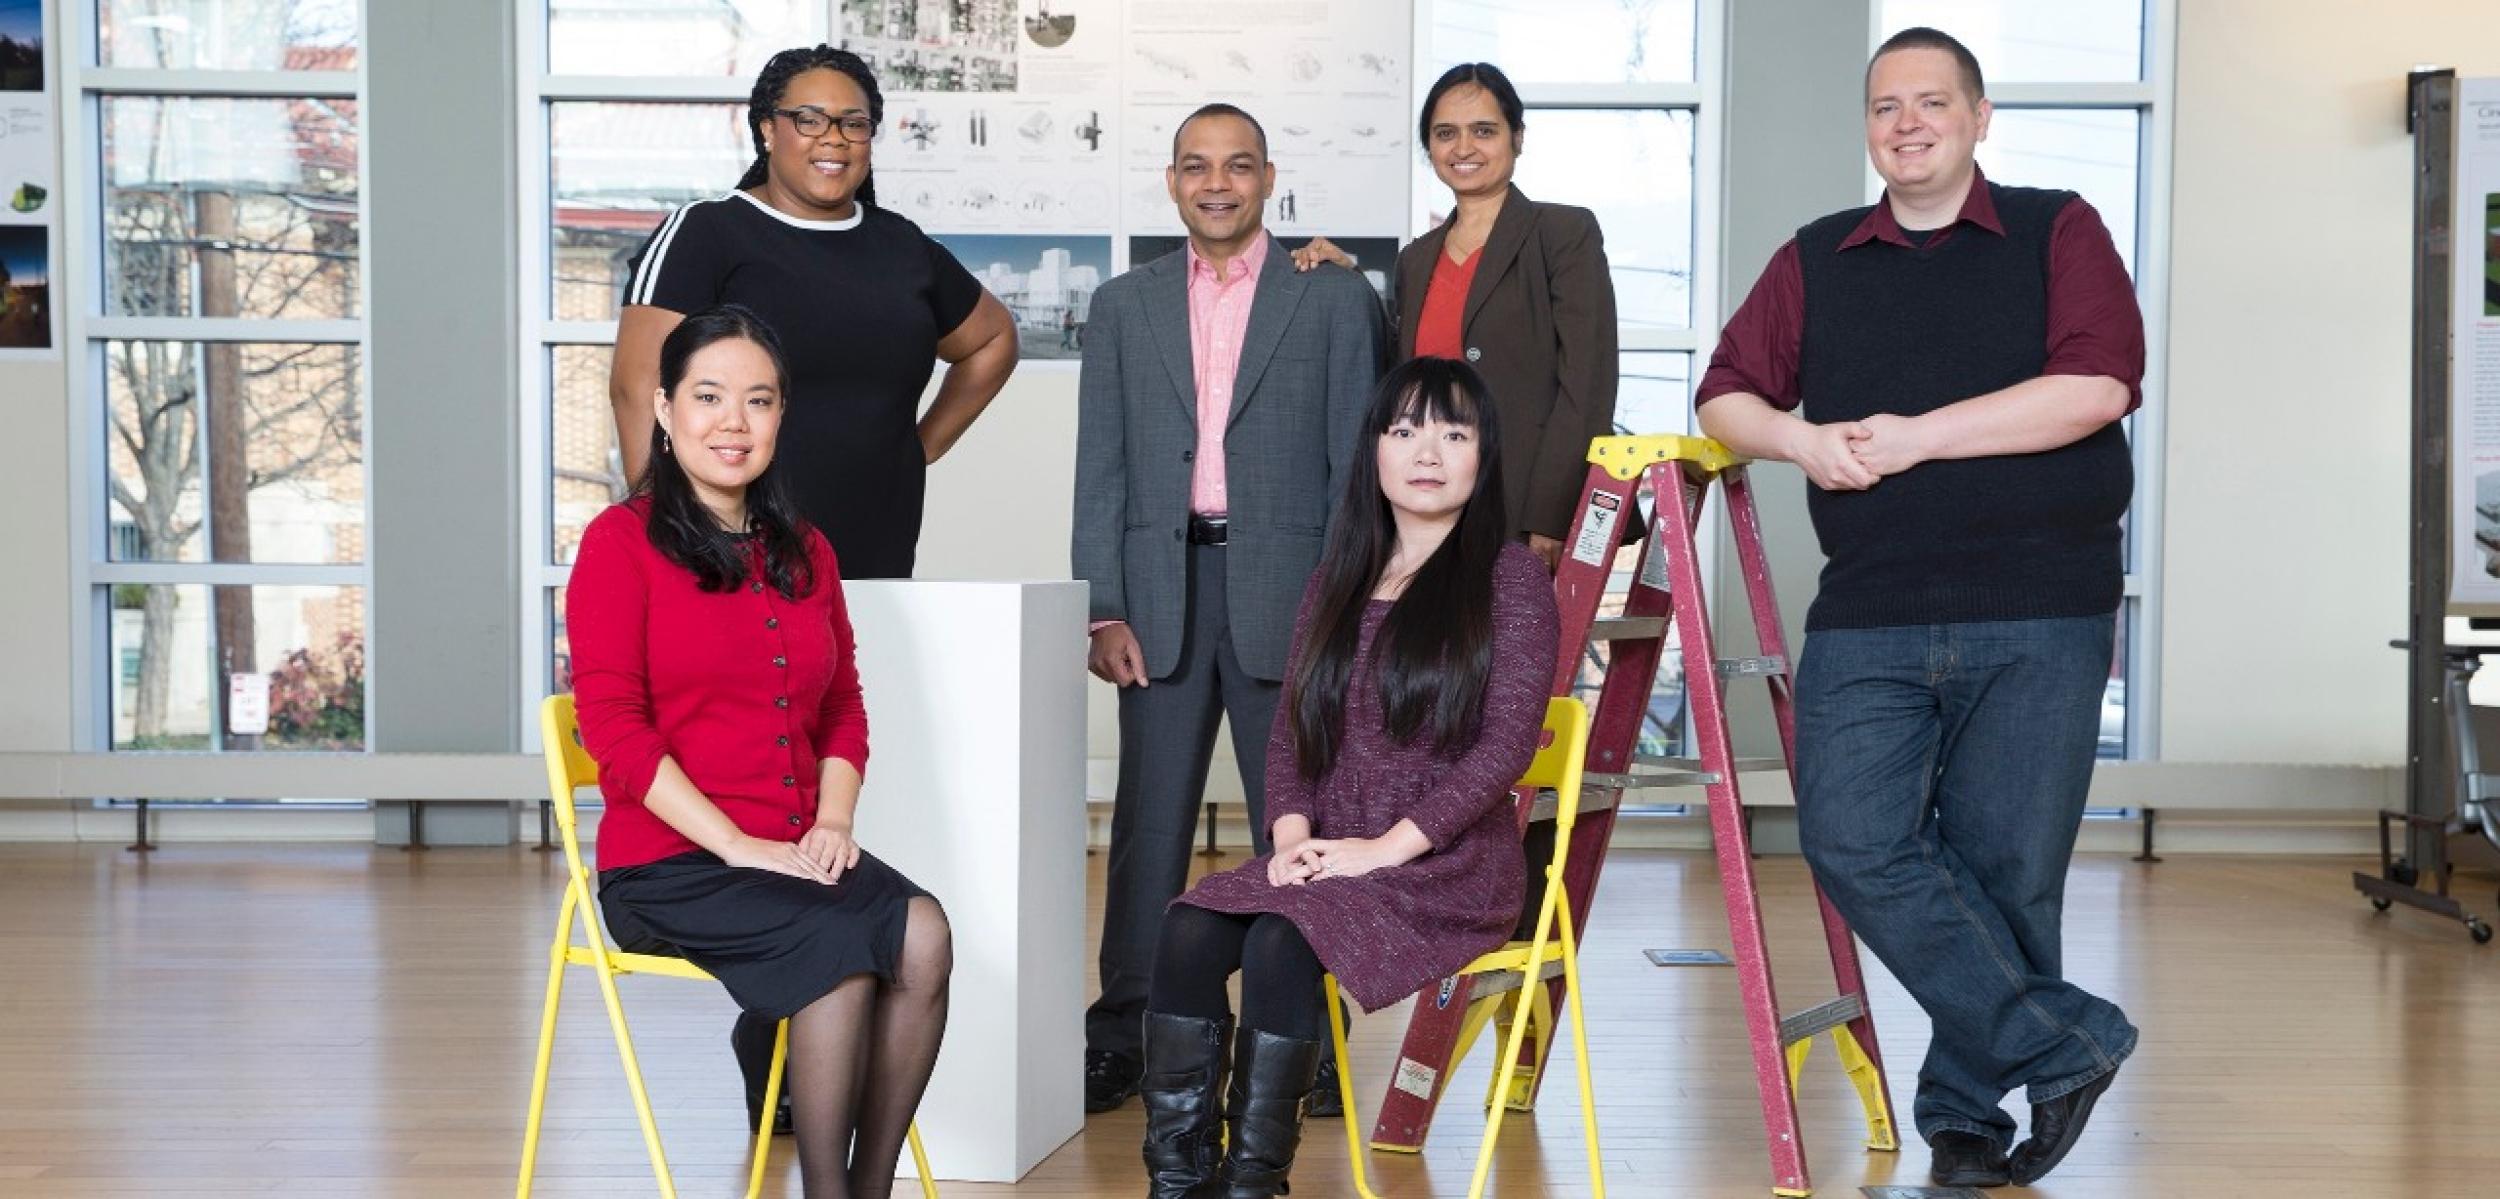 Hong Cheng (seated), Christina Campbell, Pravin Bhiwapukar, Guo Freeman (seated), Shailaja Paik and Robert Freeman